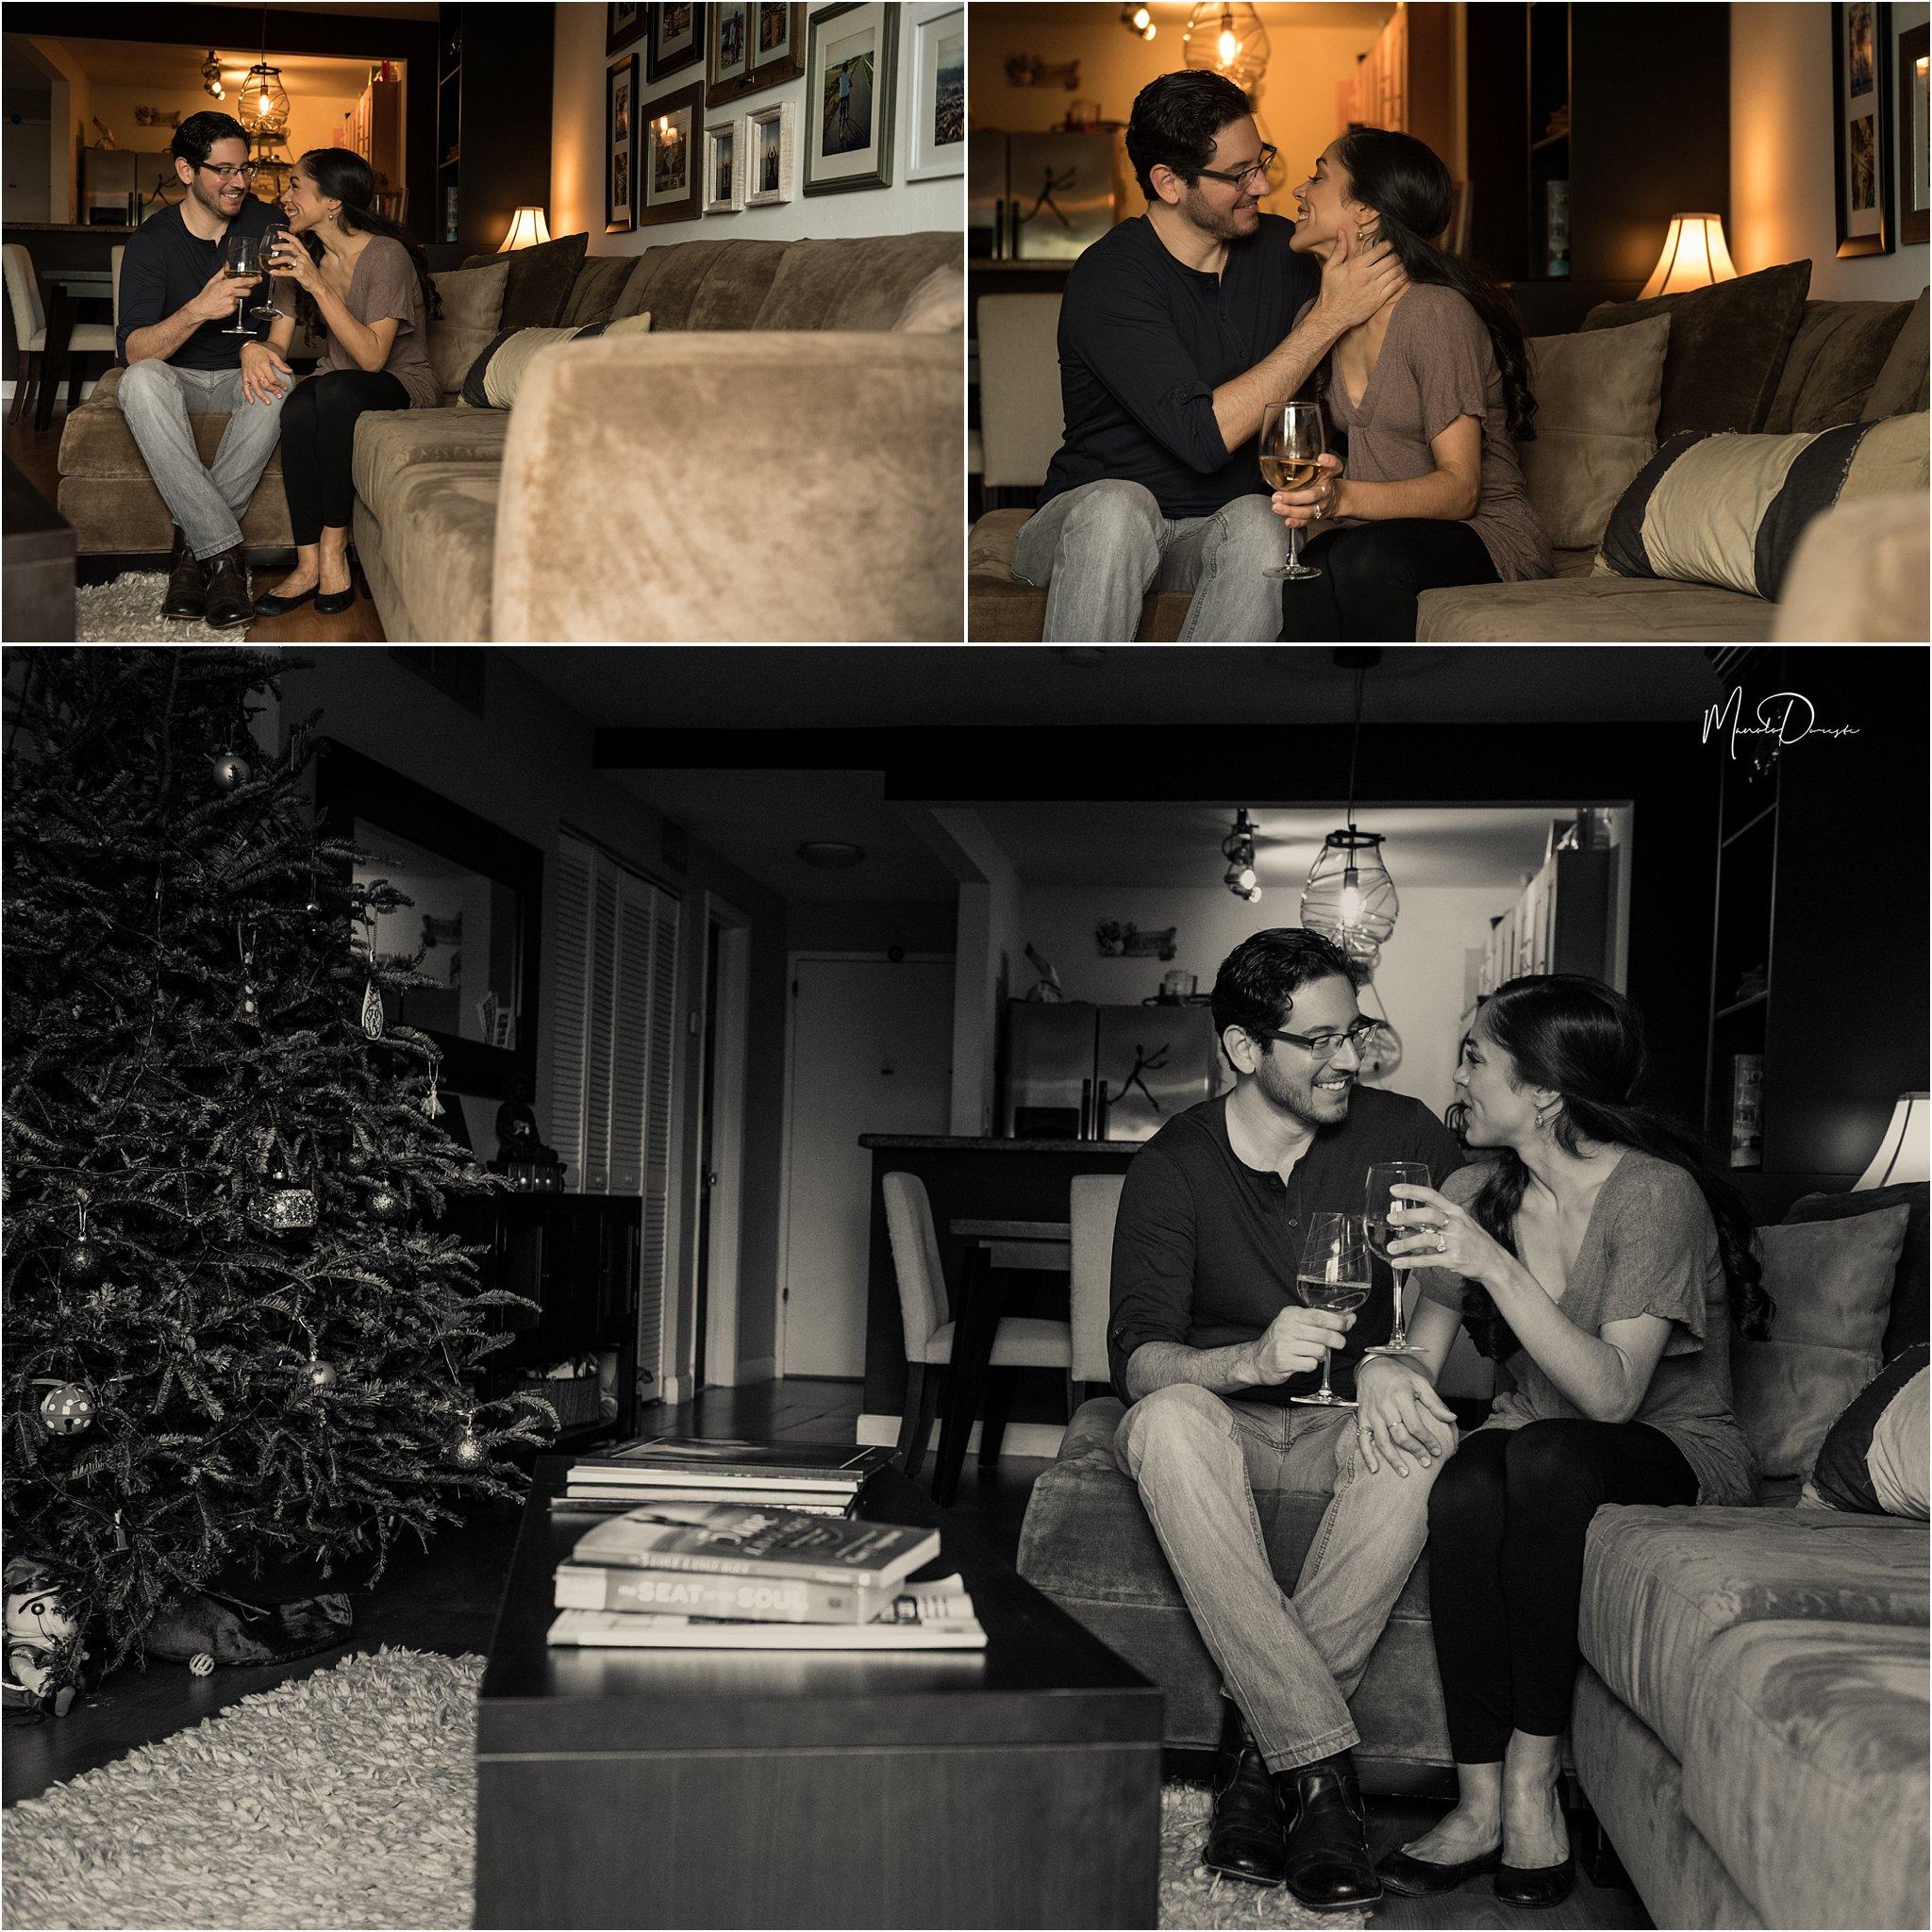 00767_ManoloDoreste_InFocusStudios_Wedding_Family_Photography_Miami_MiamiPhotographer.jpg